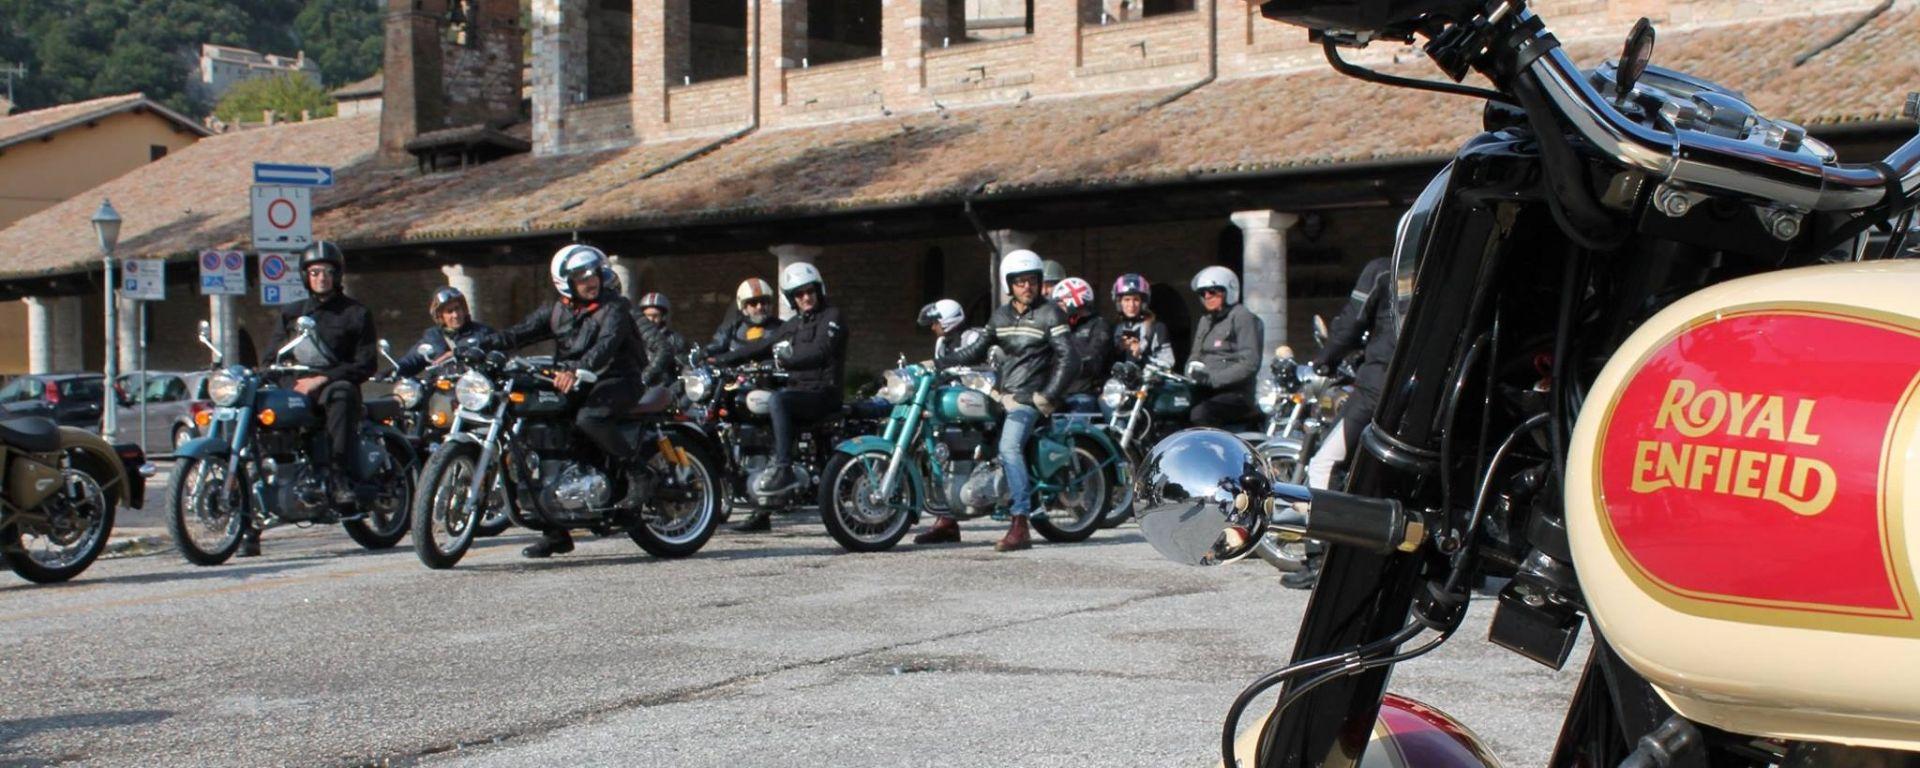 Royal Enfield Italian Meeting: musica, moto e buon cibo